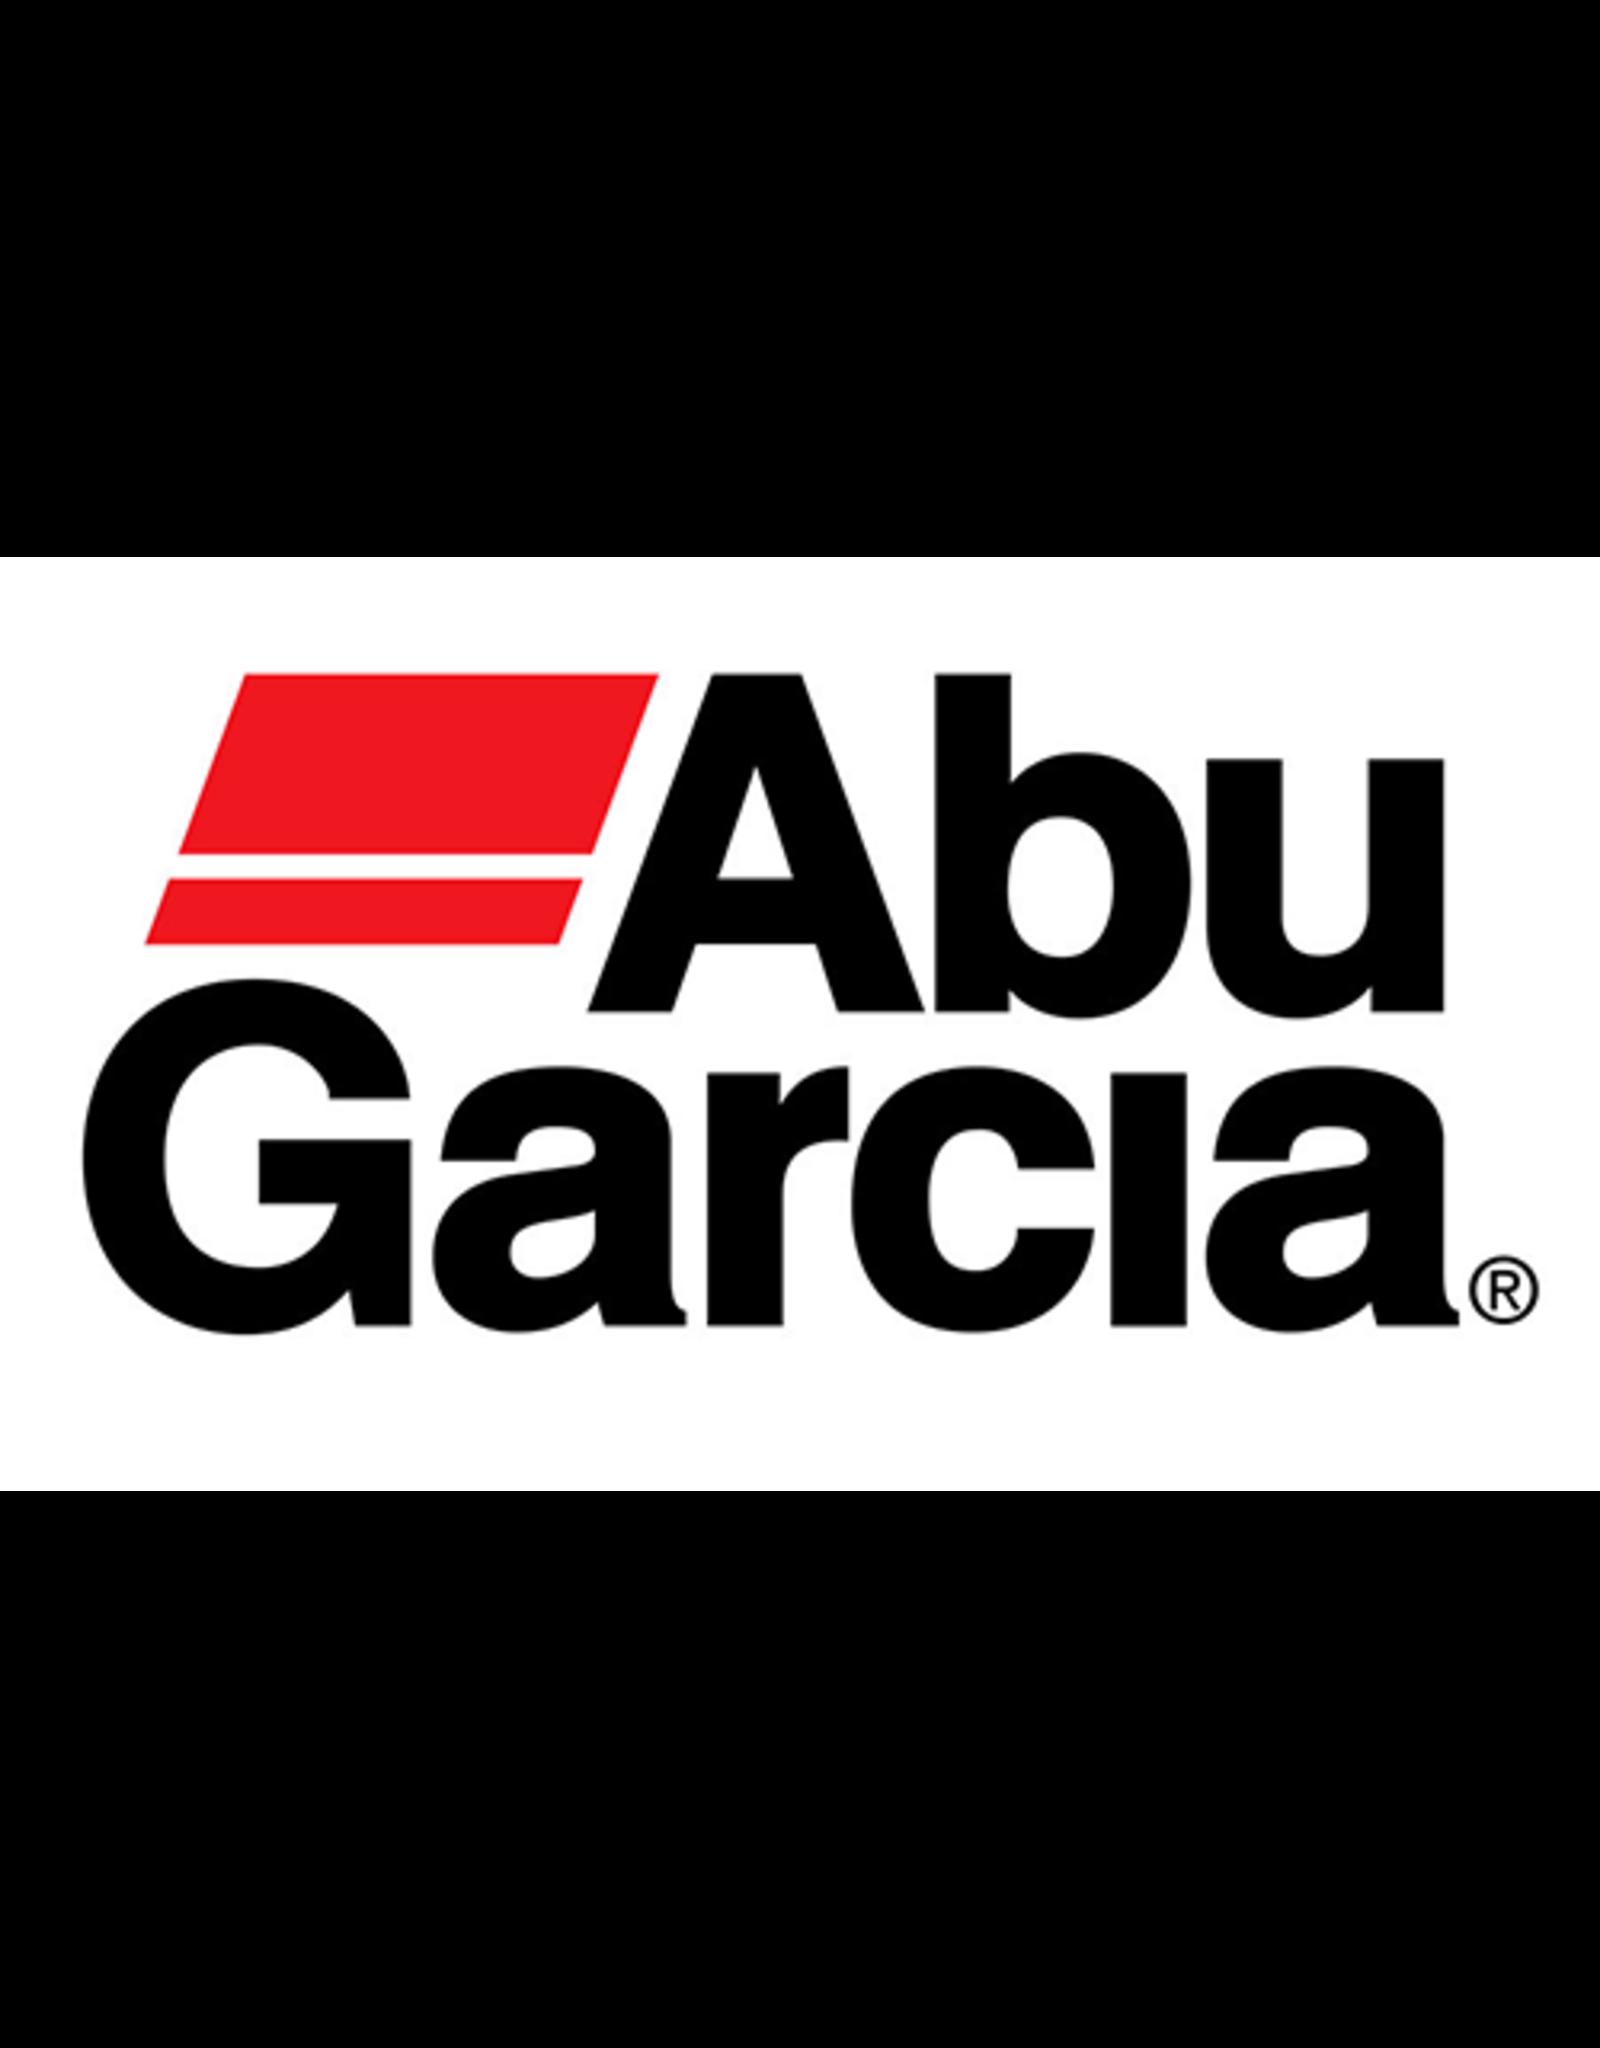 Abu Garcia DRIVE SHAFT+RATCHE - DISCONTINUED